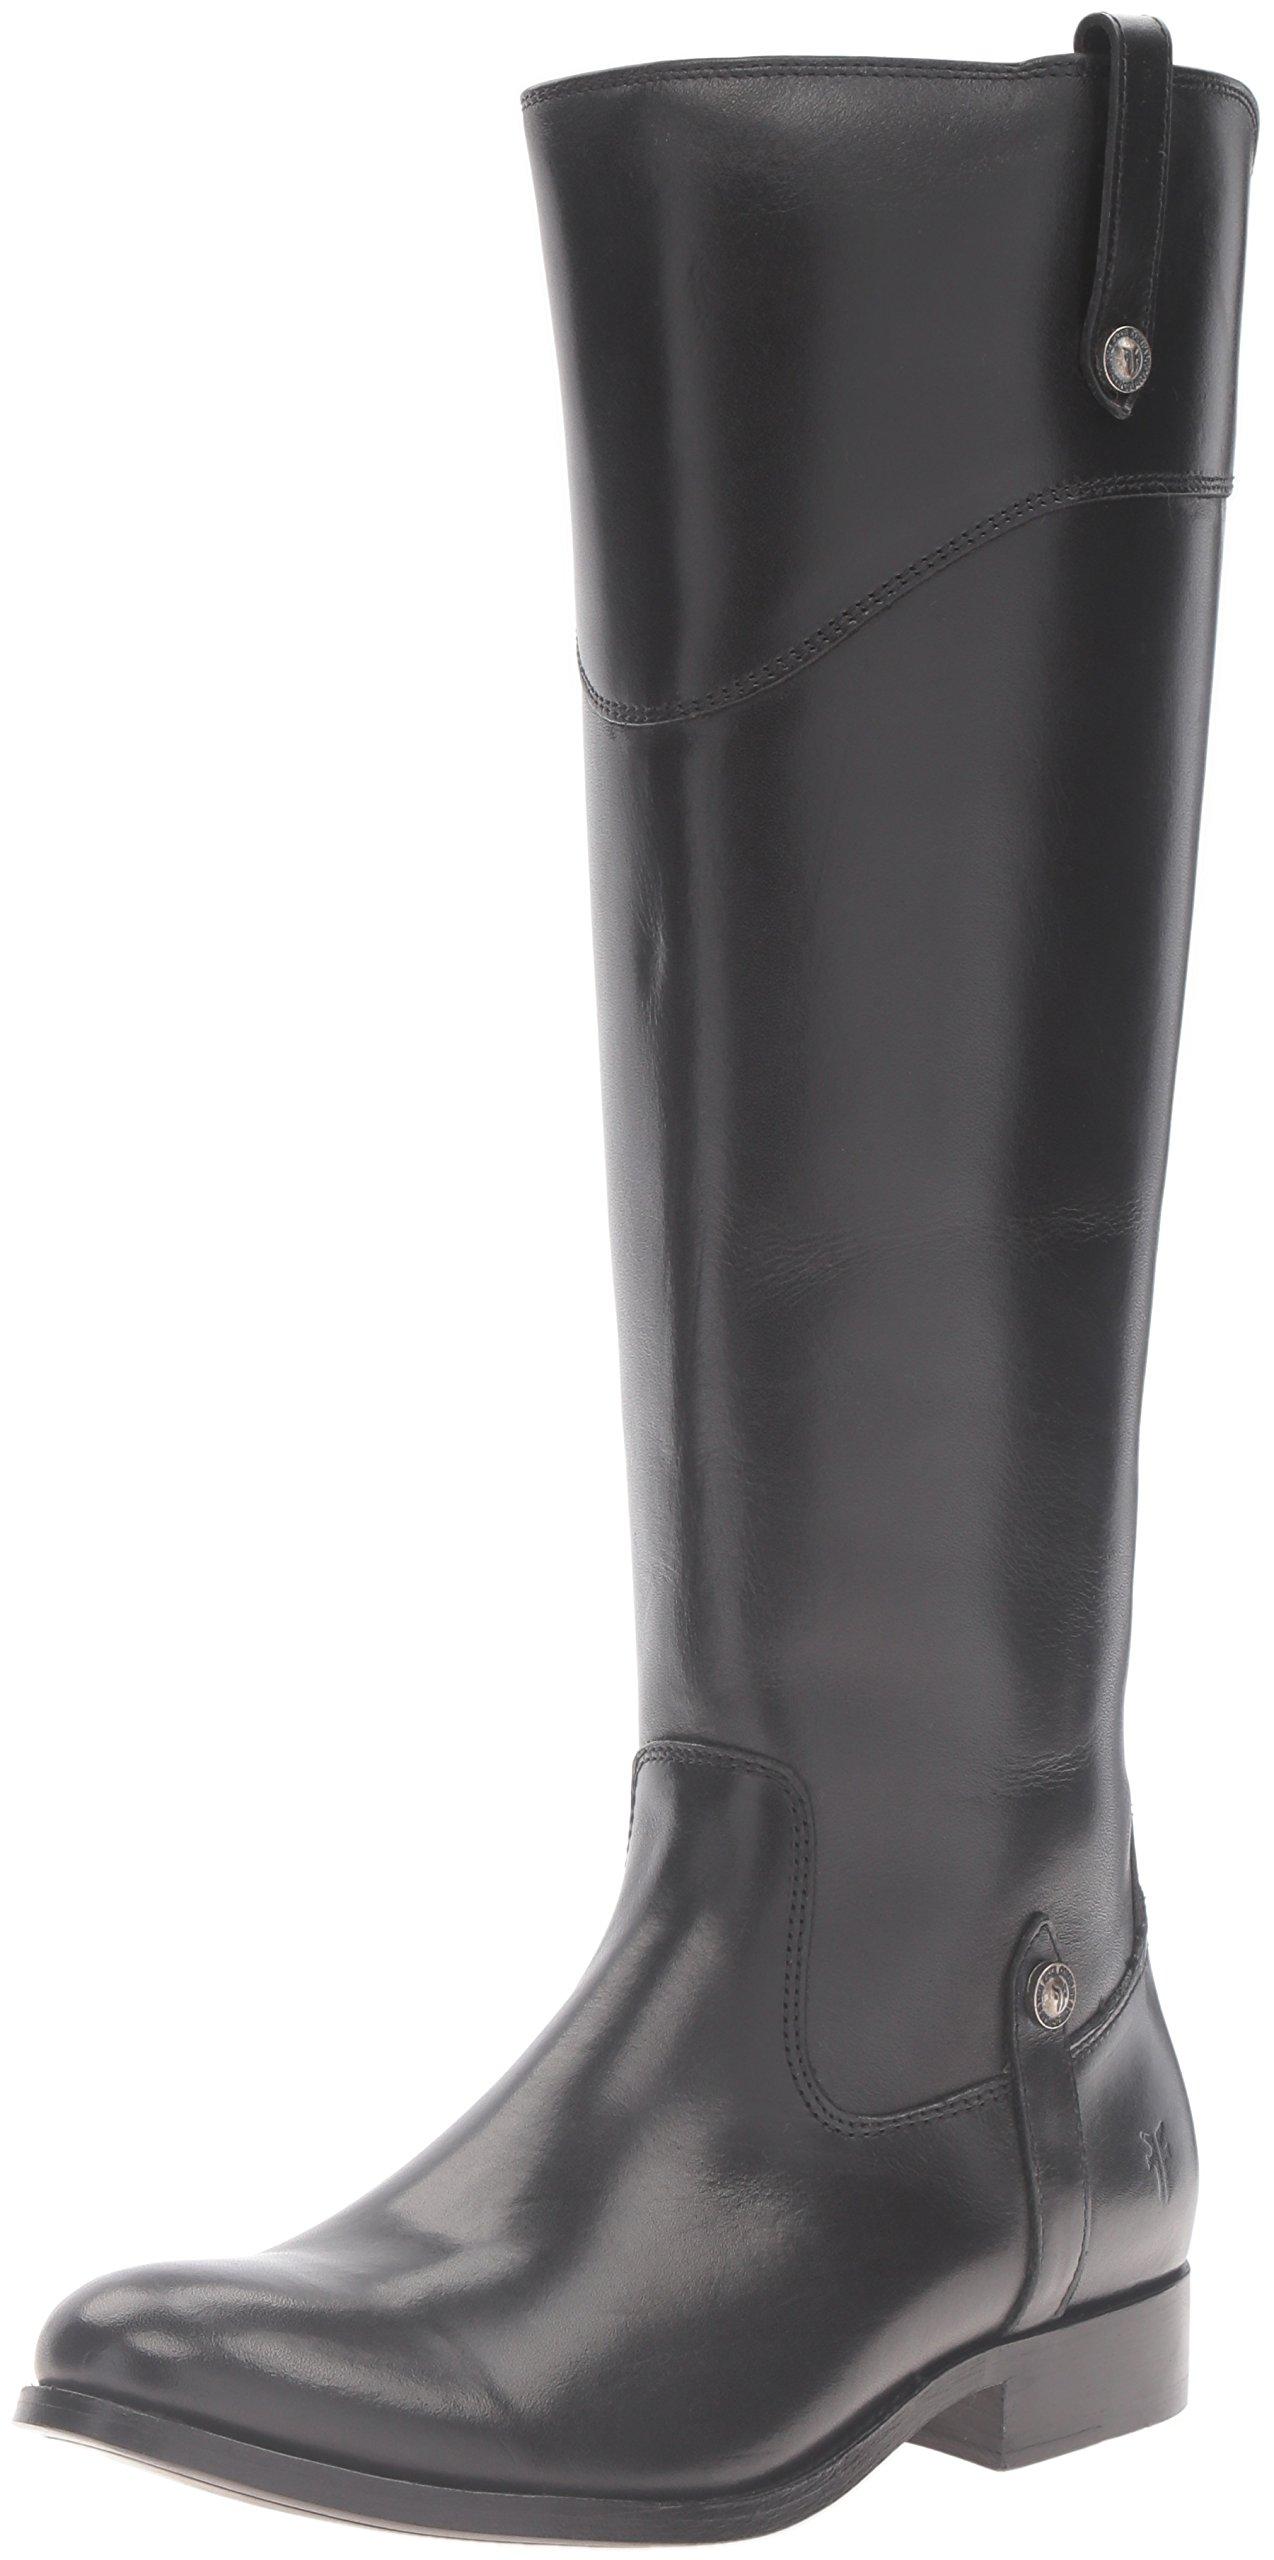 FRYE Women's Melissa Tab Tall Riding Boot, Black, 9 M US